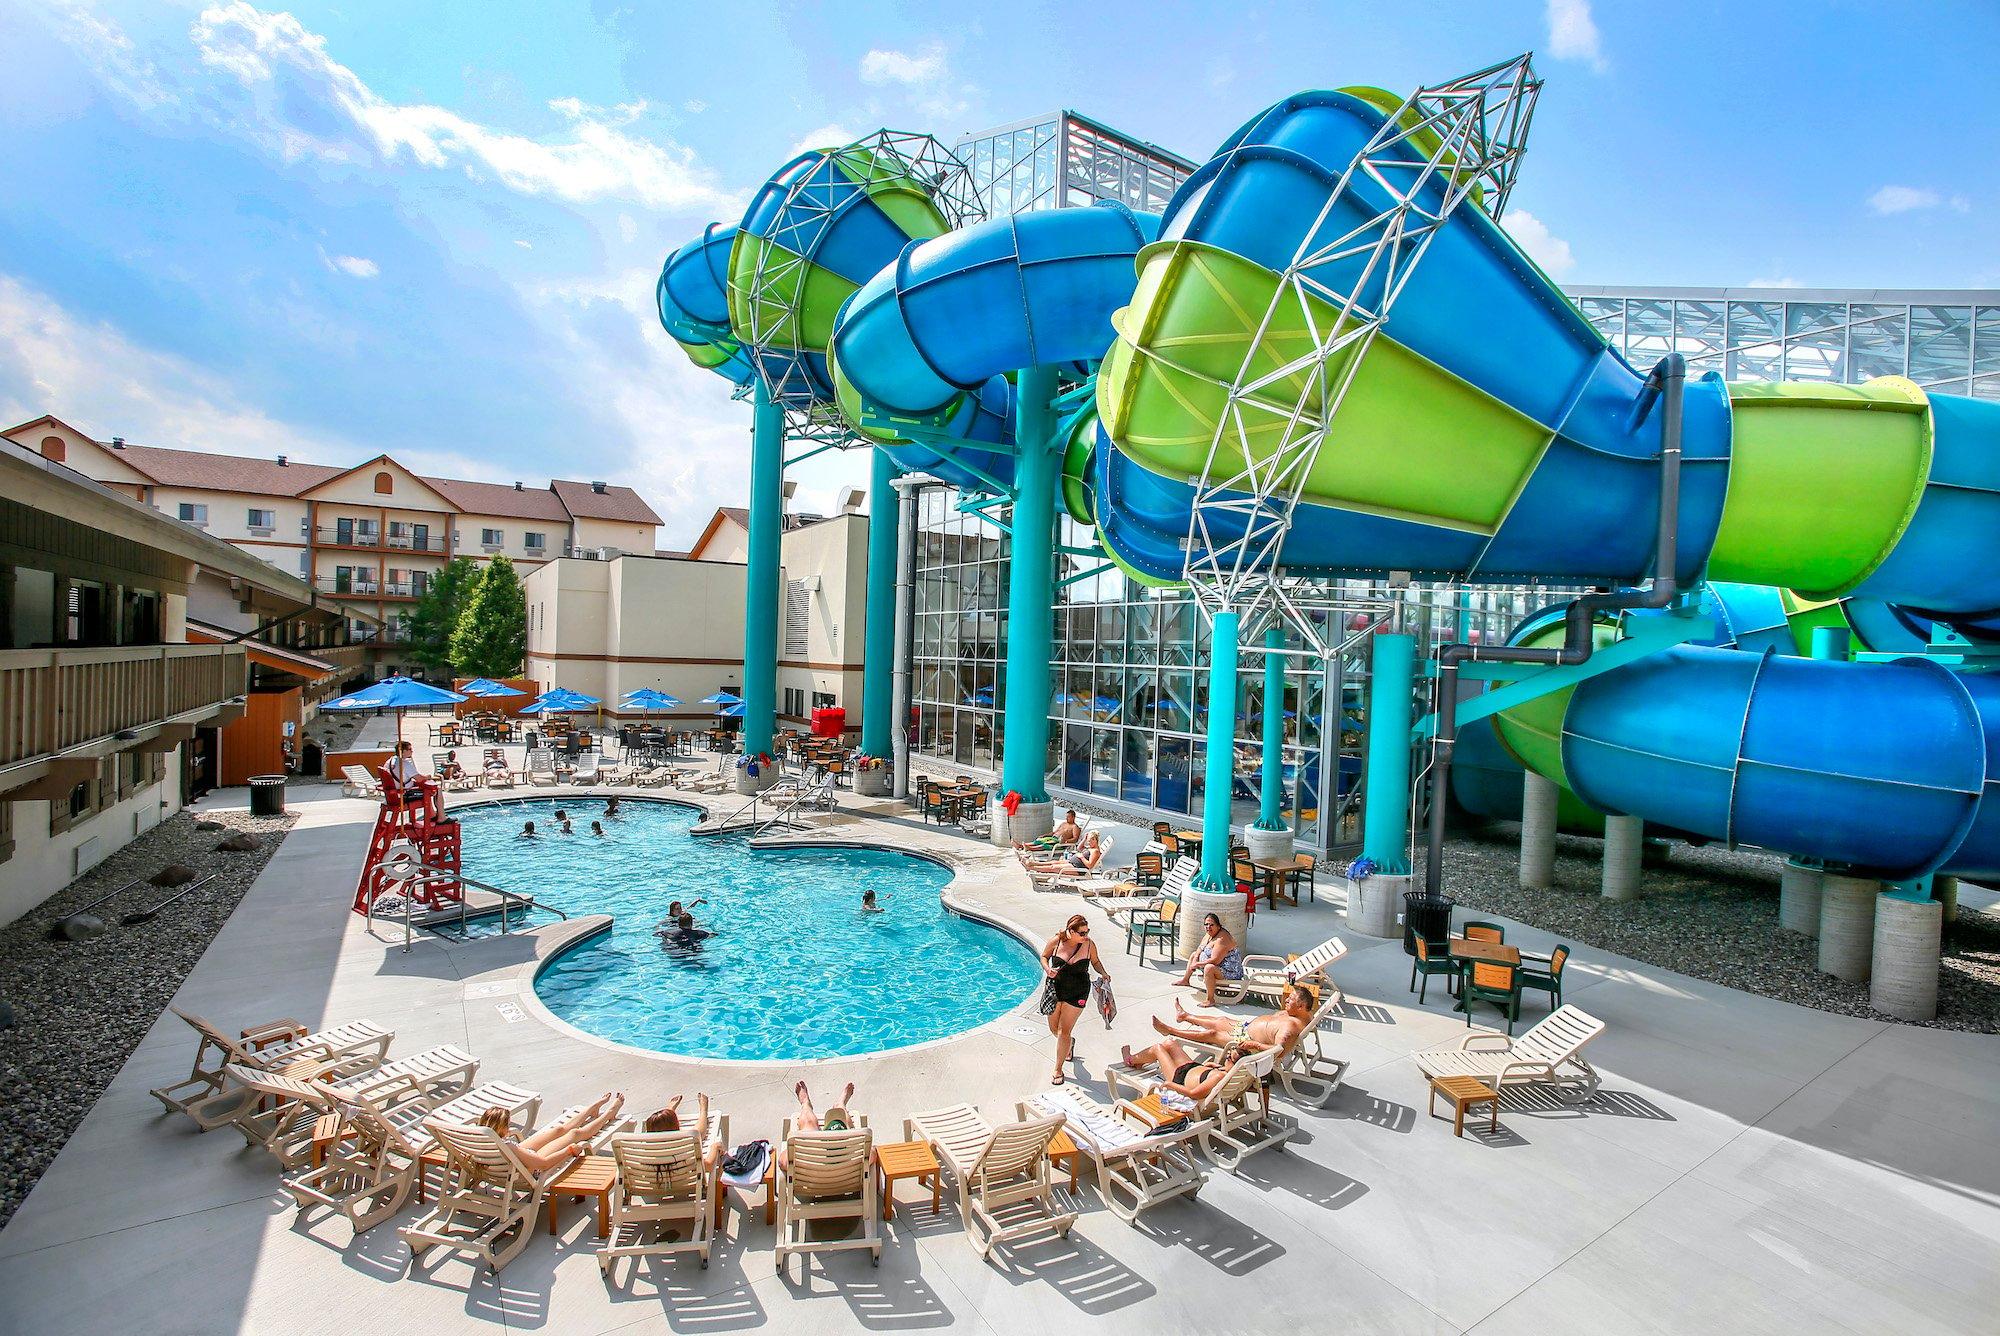 Zehnder's Splash Village Hotel And Waterpark Outdoor Pool